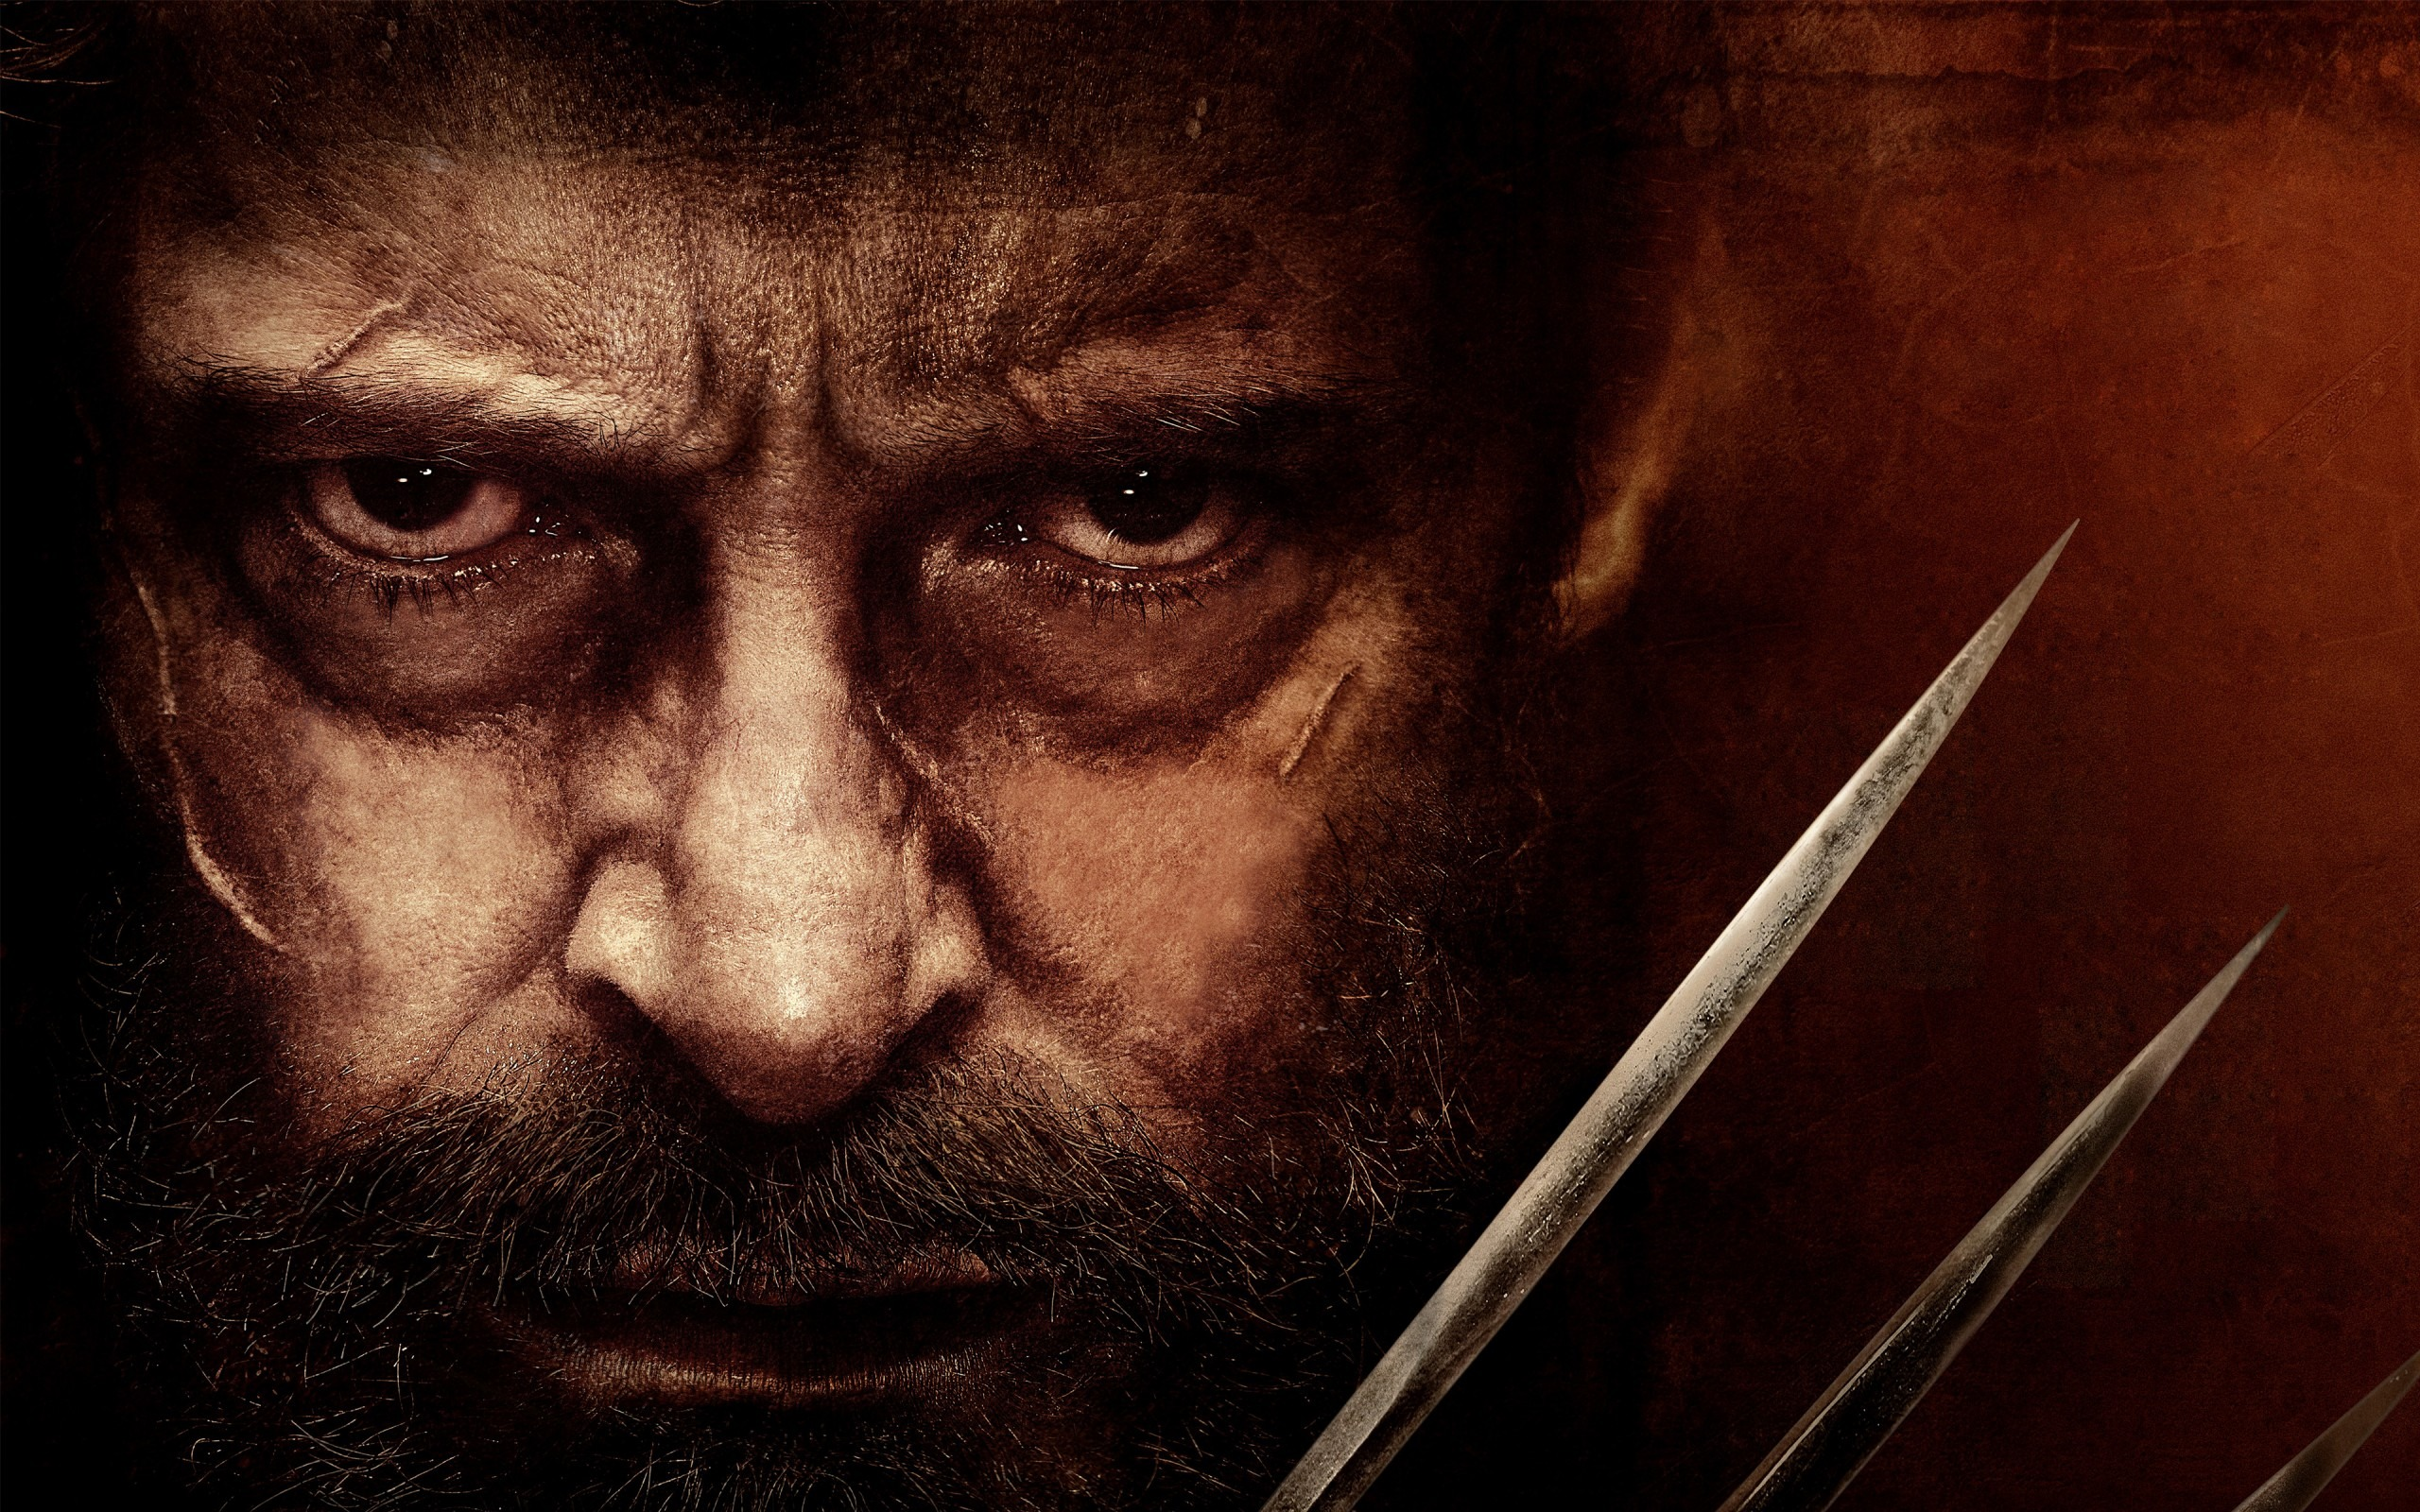 Logan 2017 Movie Hd Wallpapers Avance 10wallpapercom